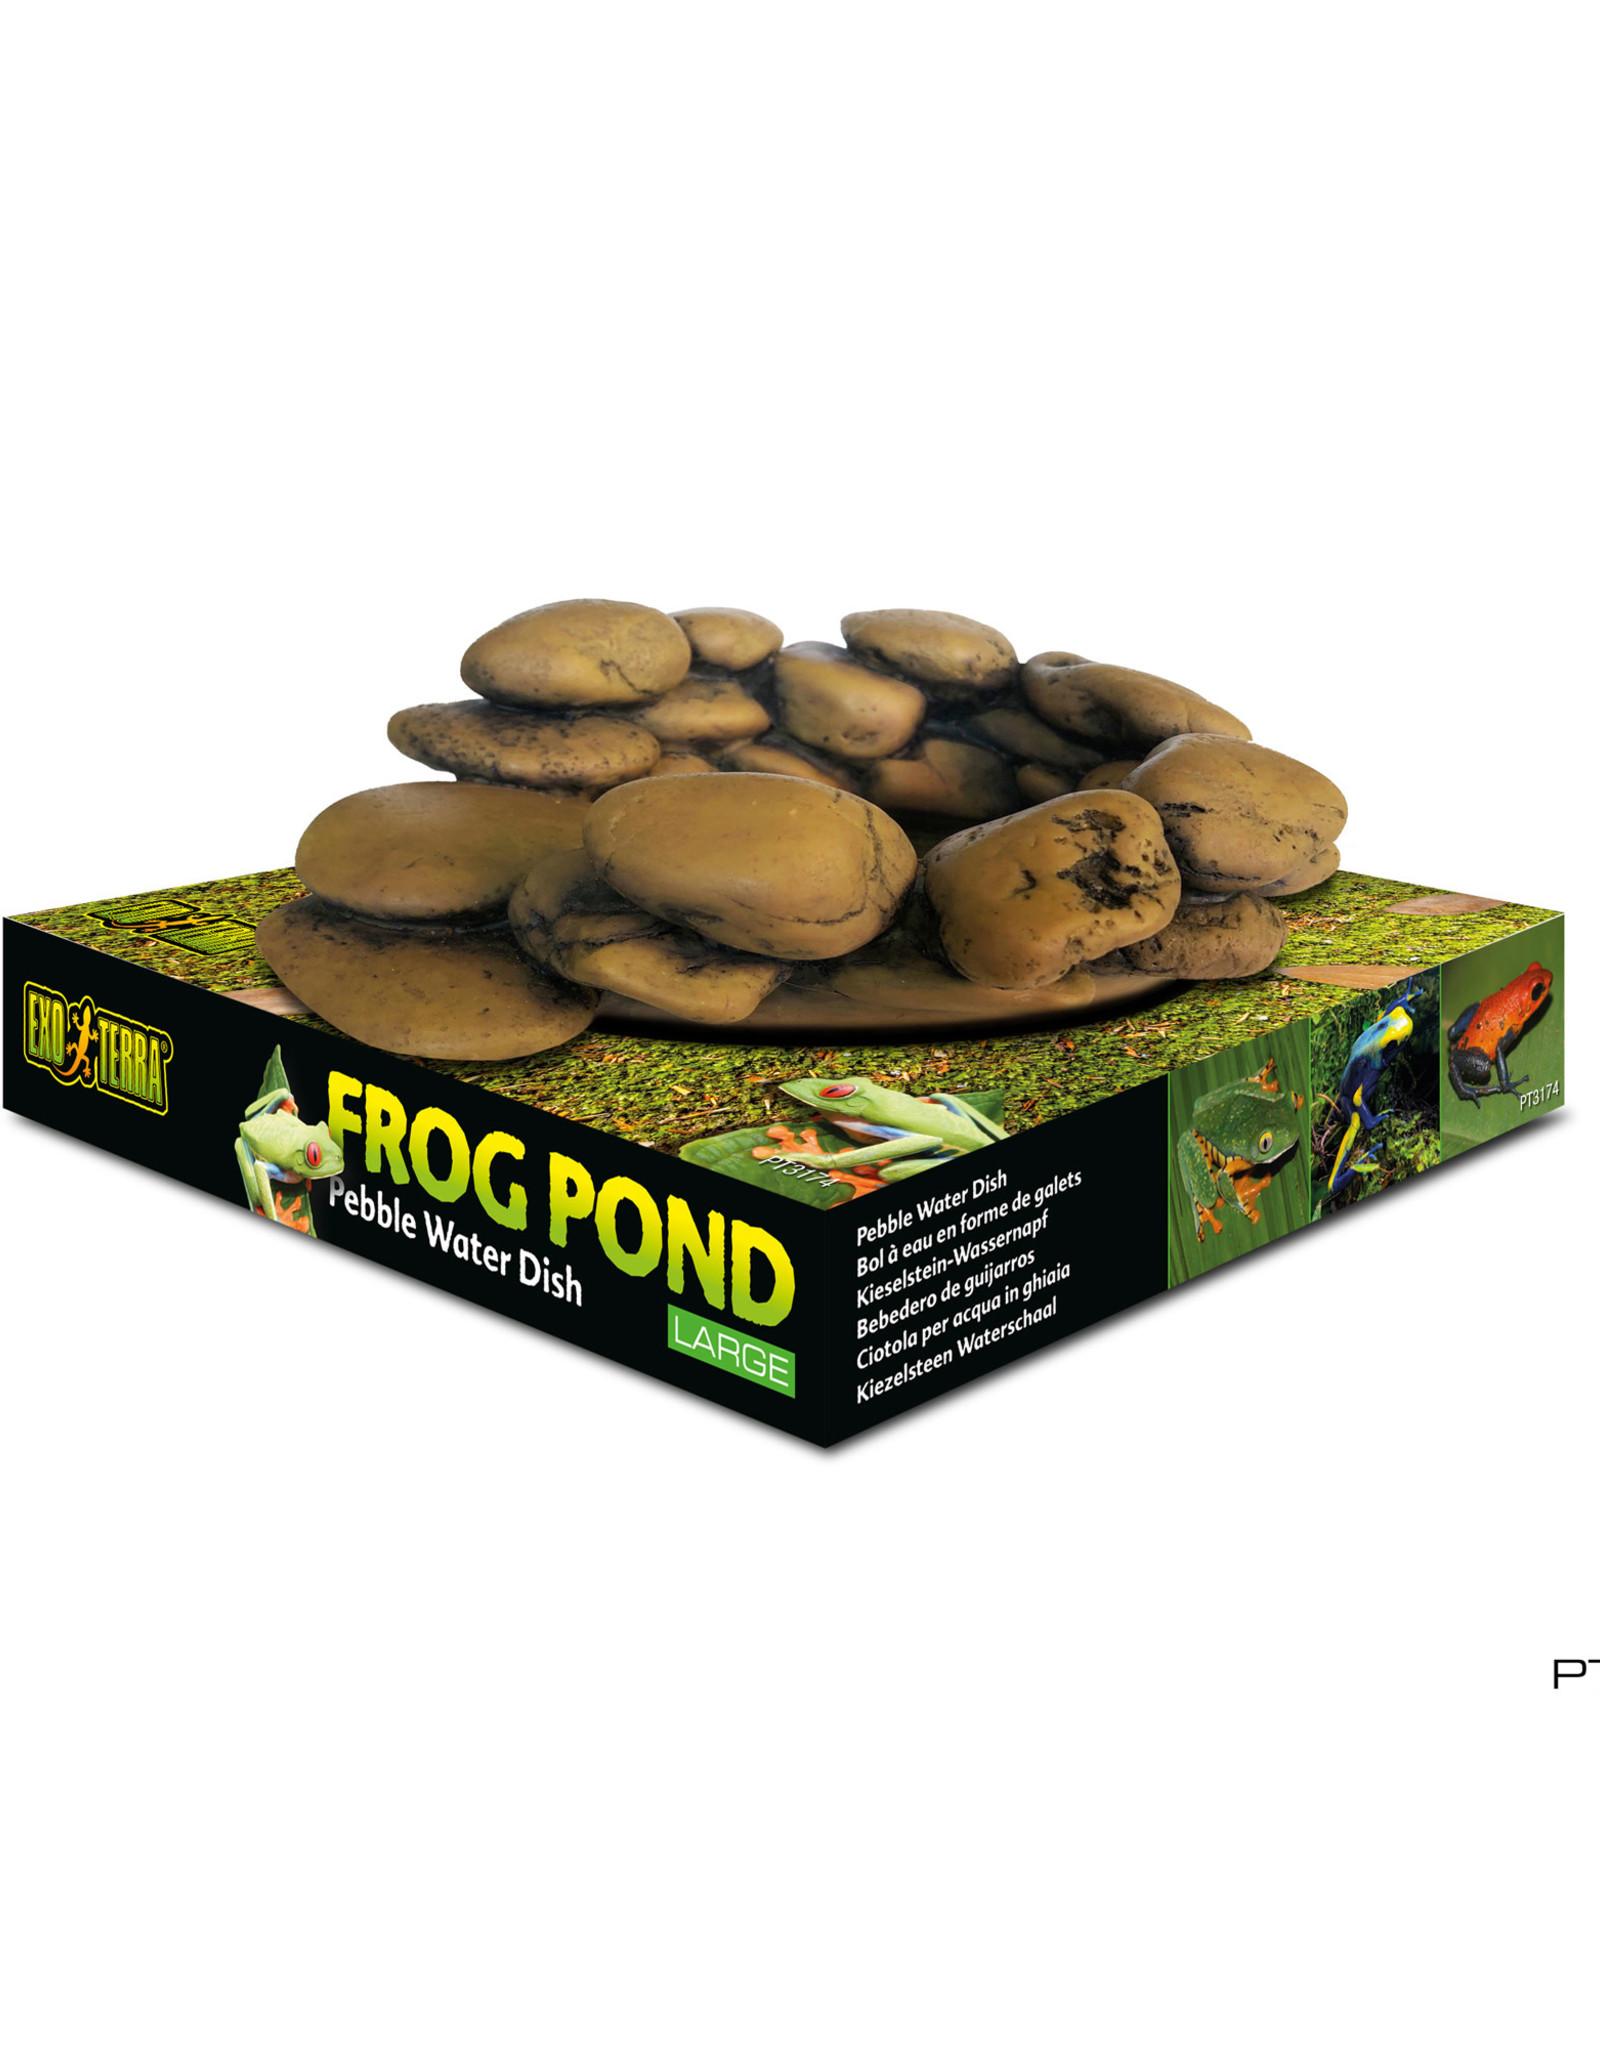 EXO-TERRA Exo Terra Frog Pond - Large - 15 L x 12,5 W x 5,5 H cm (6 x 5 x 2.2 in) – capacity 110 mL